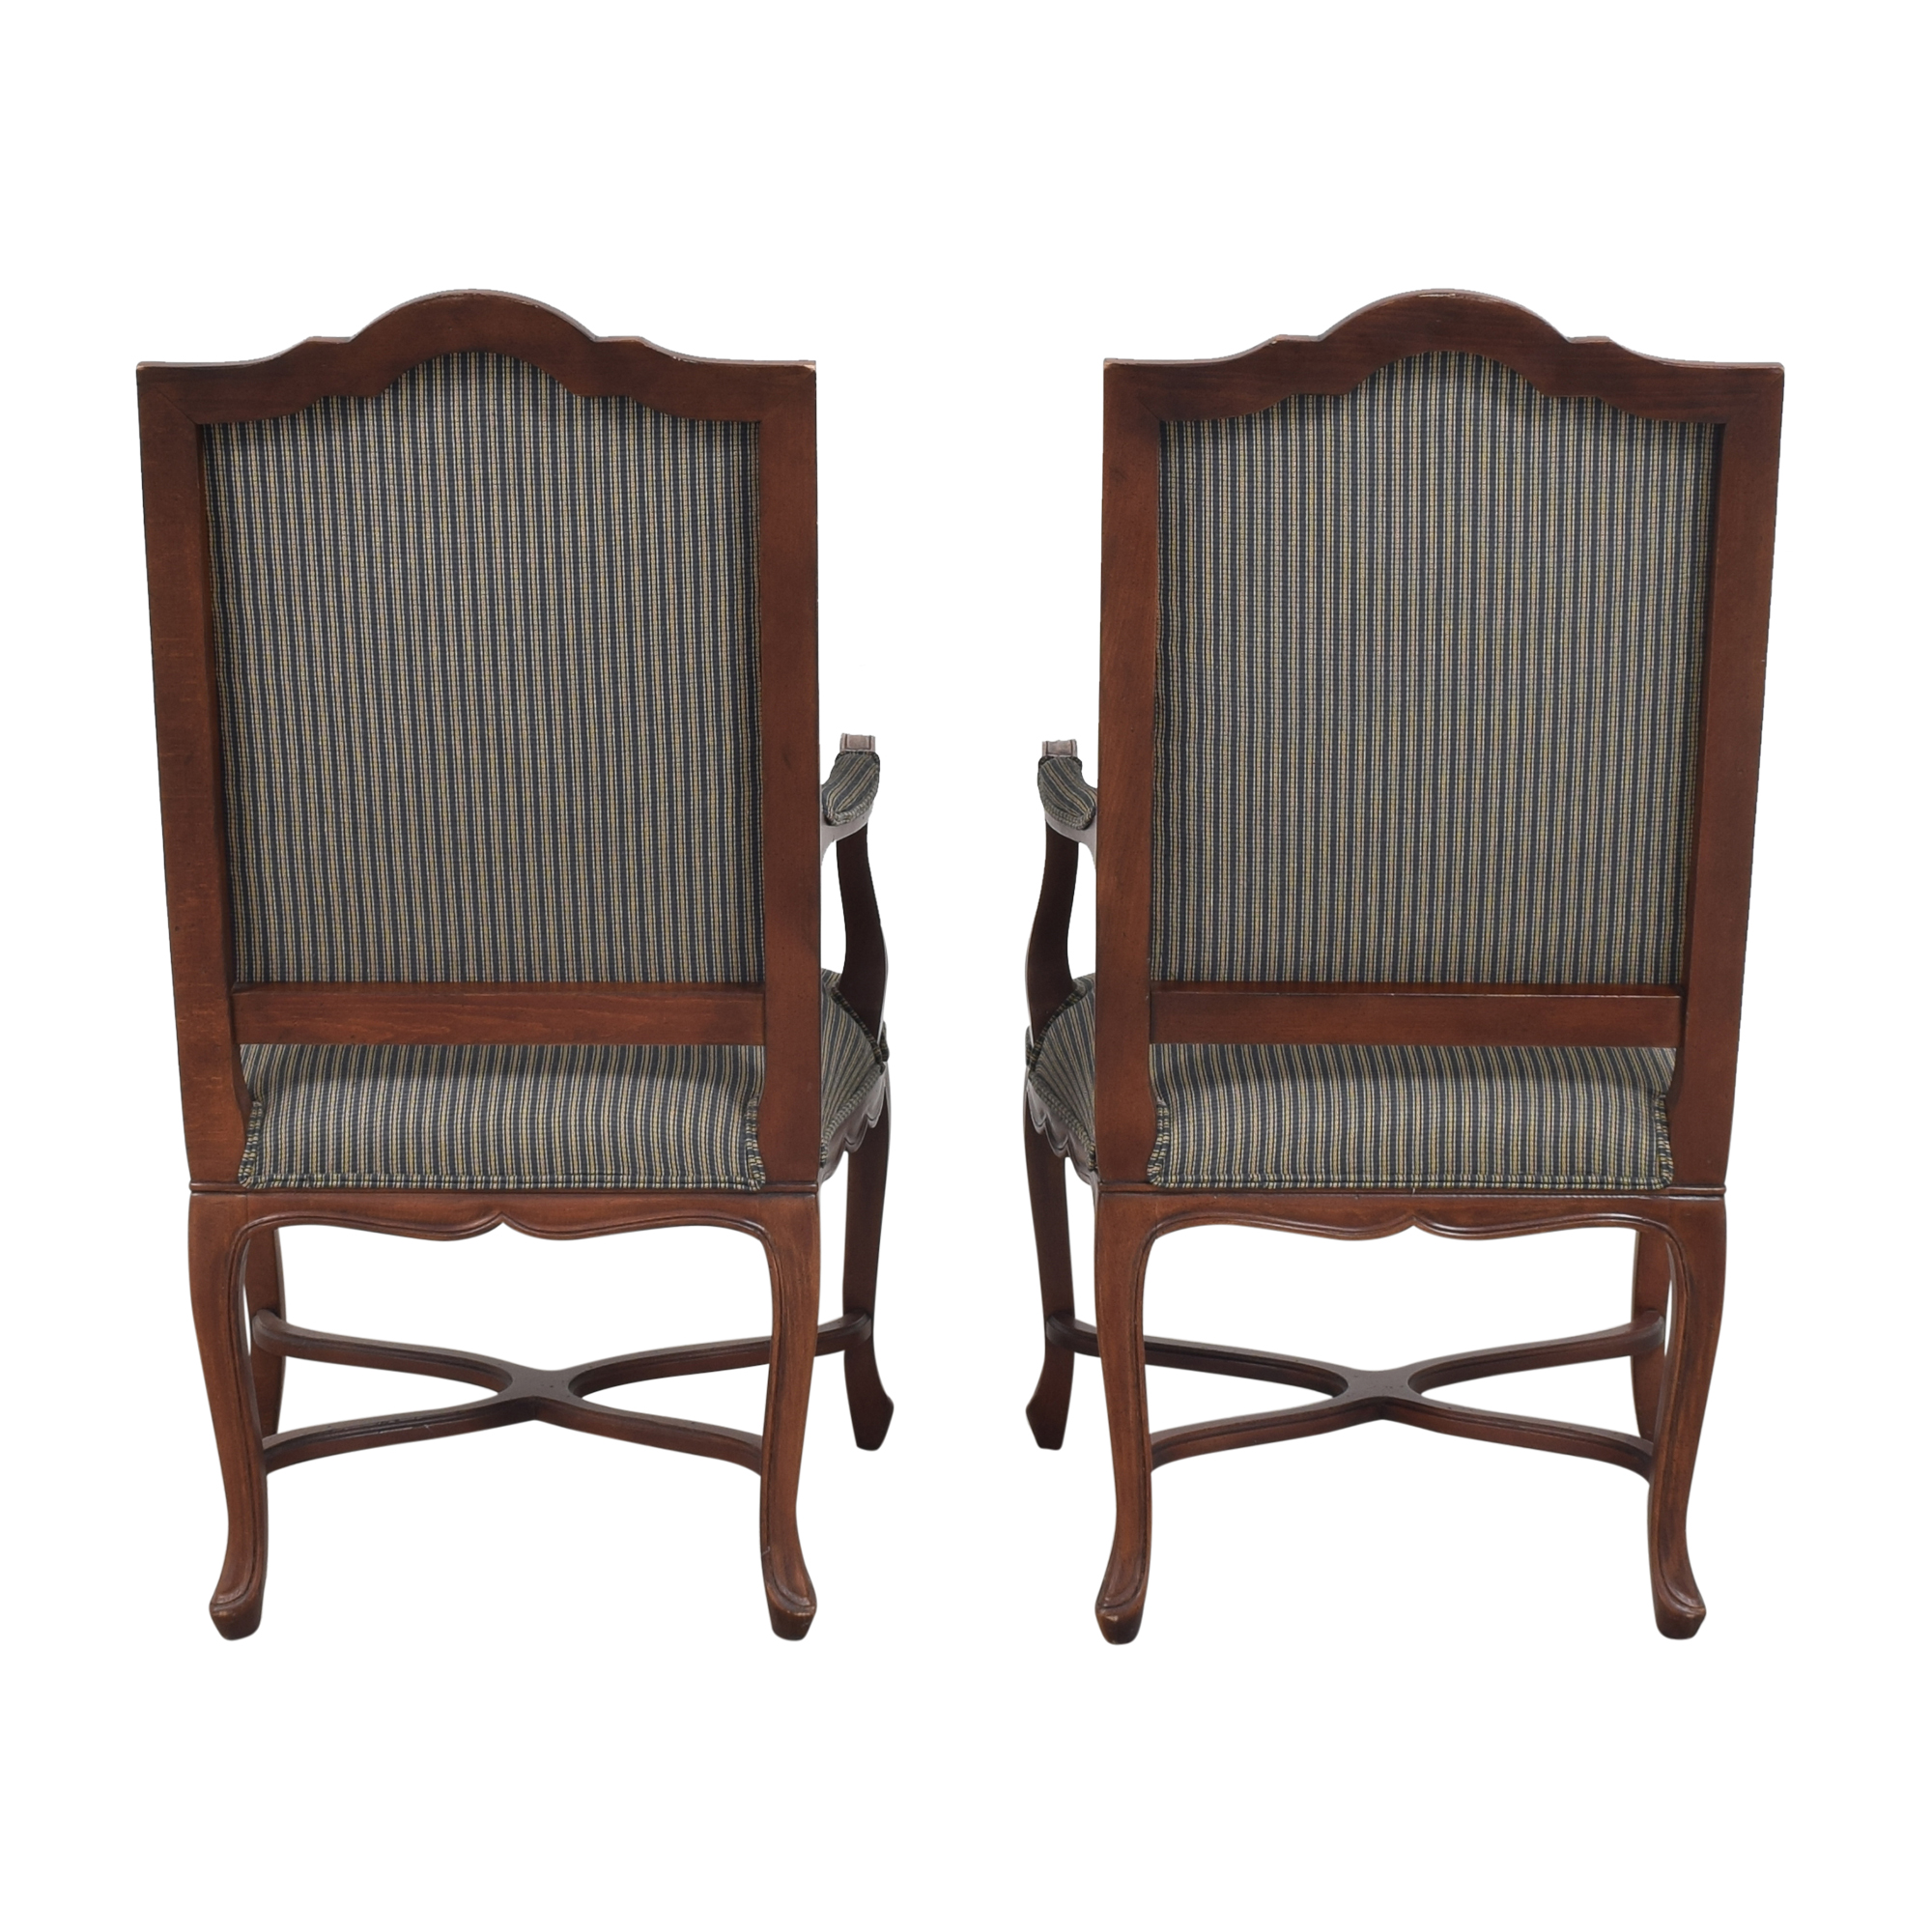 Ethan Allen Ethan Allen Dining Arm Chairs discount